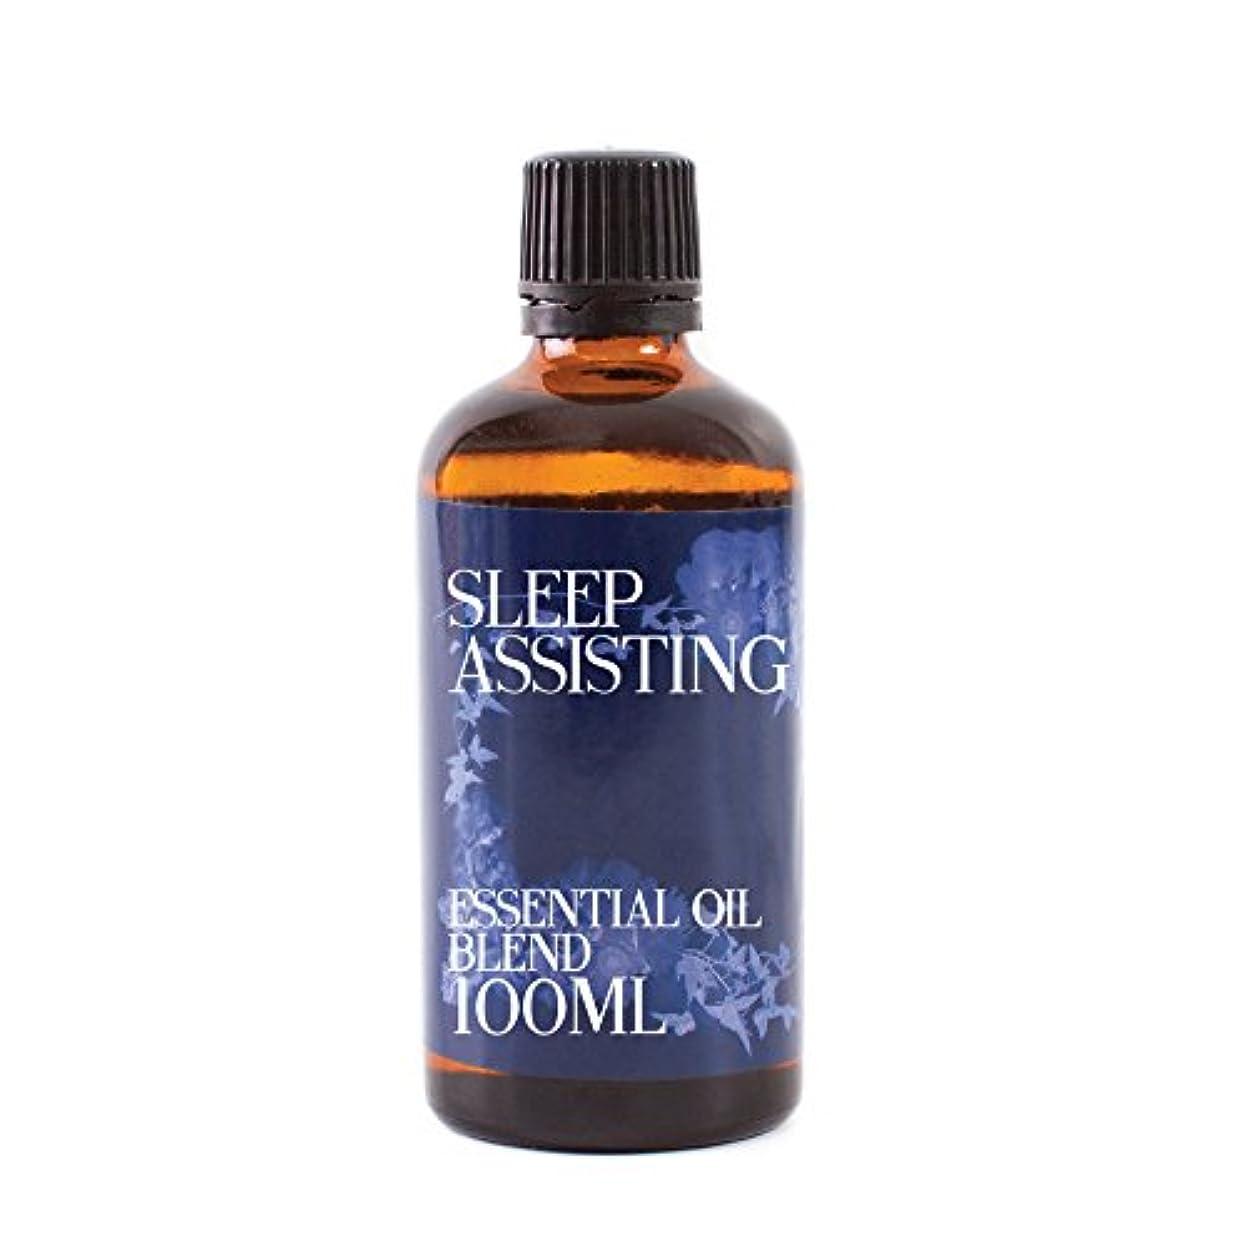 地上で酸前提条件Mystix London | Sleep Assisting Essential Oil Blend - 100ml - 100% Pure